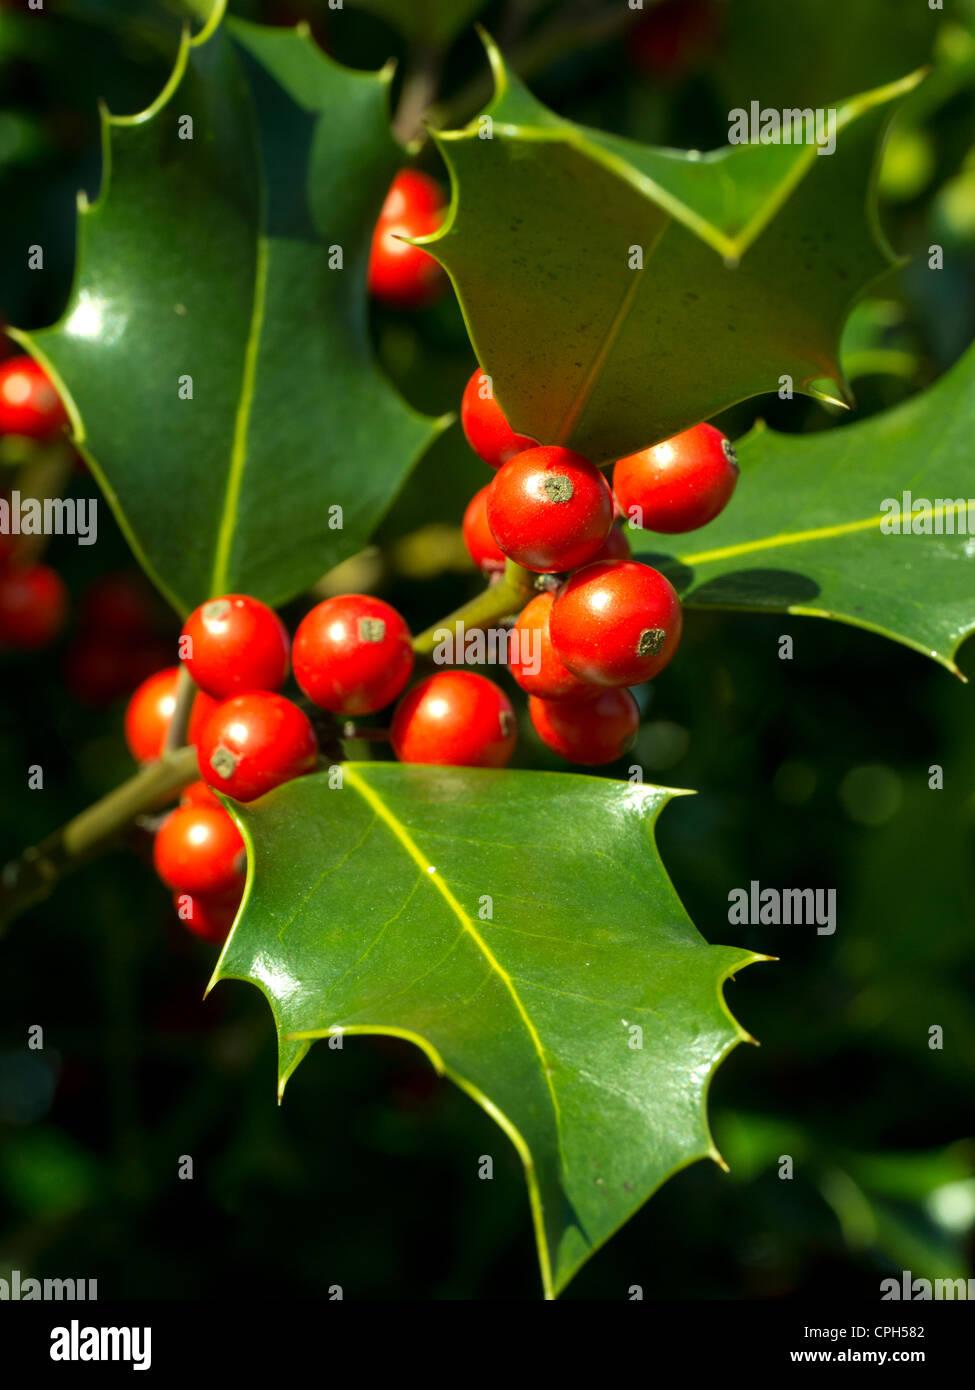 berry, drupe, Emmental, flora, fruit, shrub, bush, toxicity, inflorescence, leaf, red, nature, canton Bern, Lüderenalp, - Stock Image